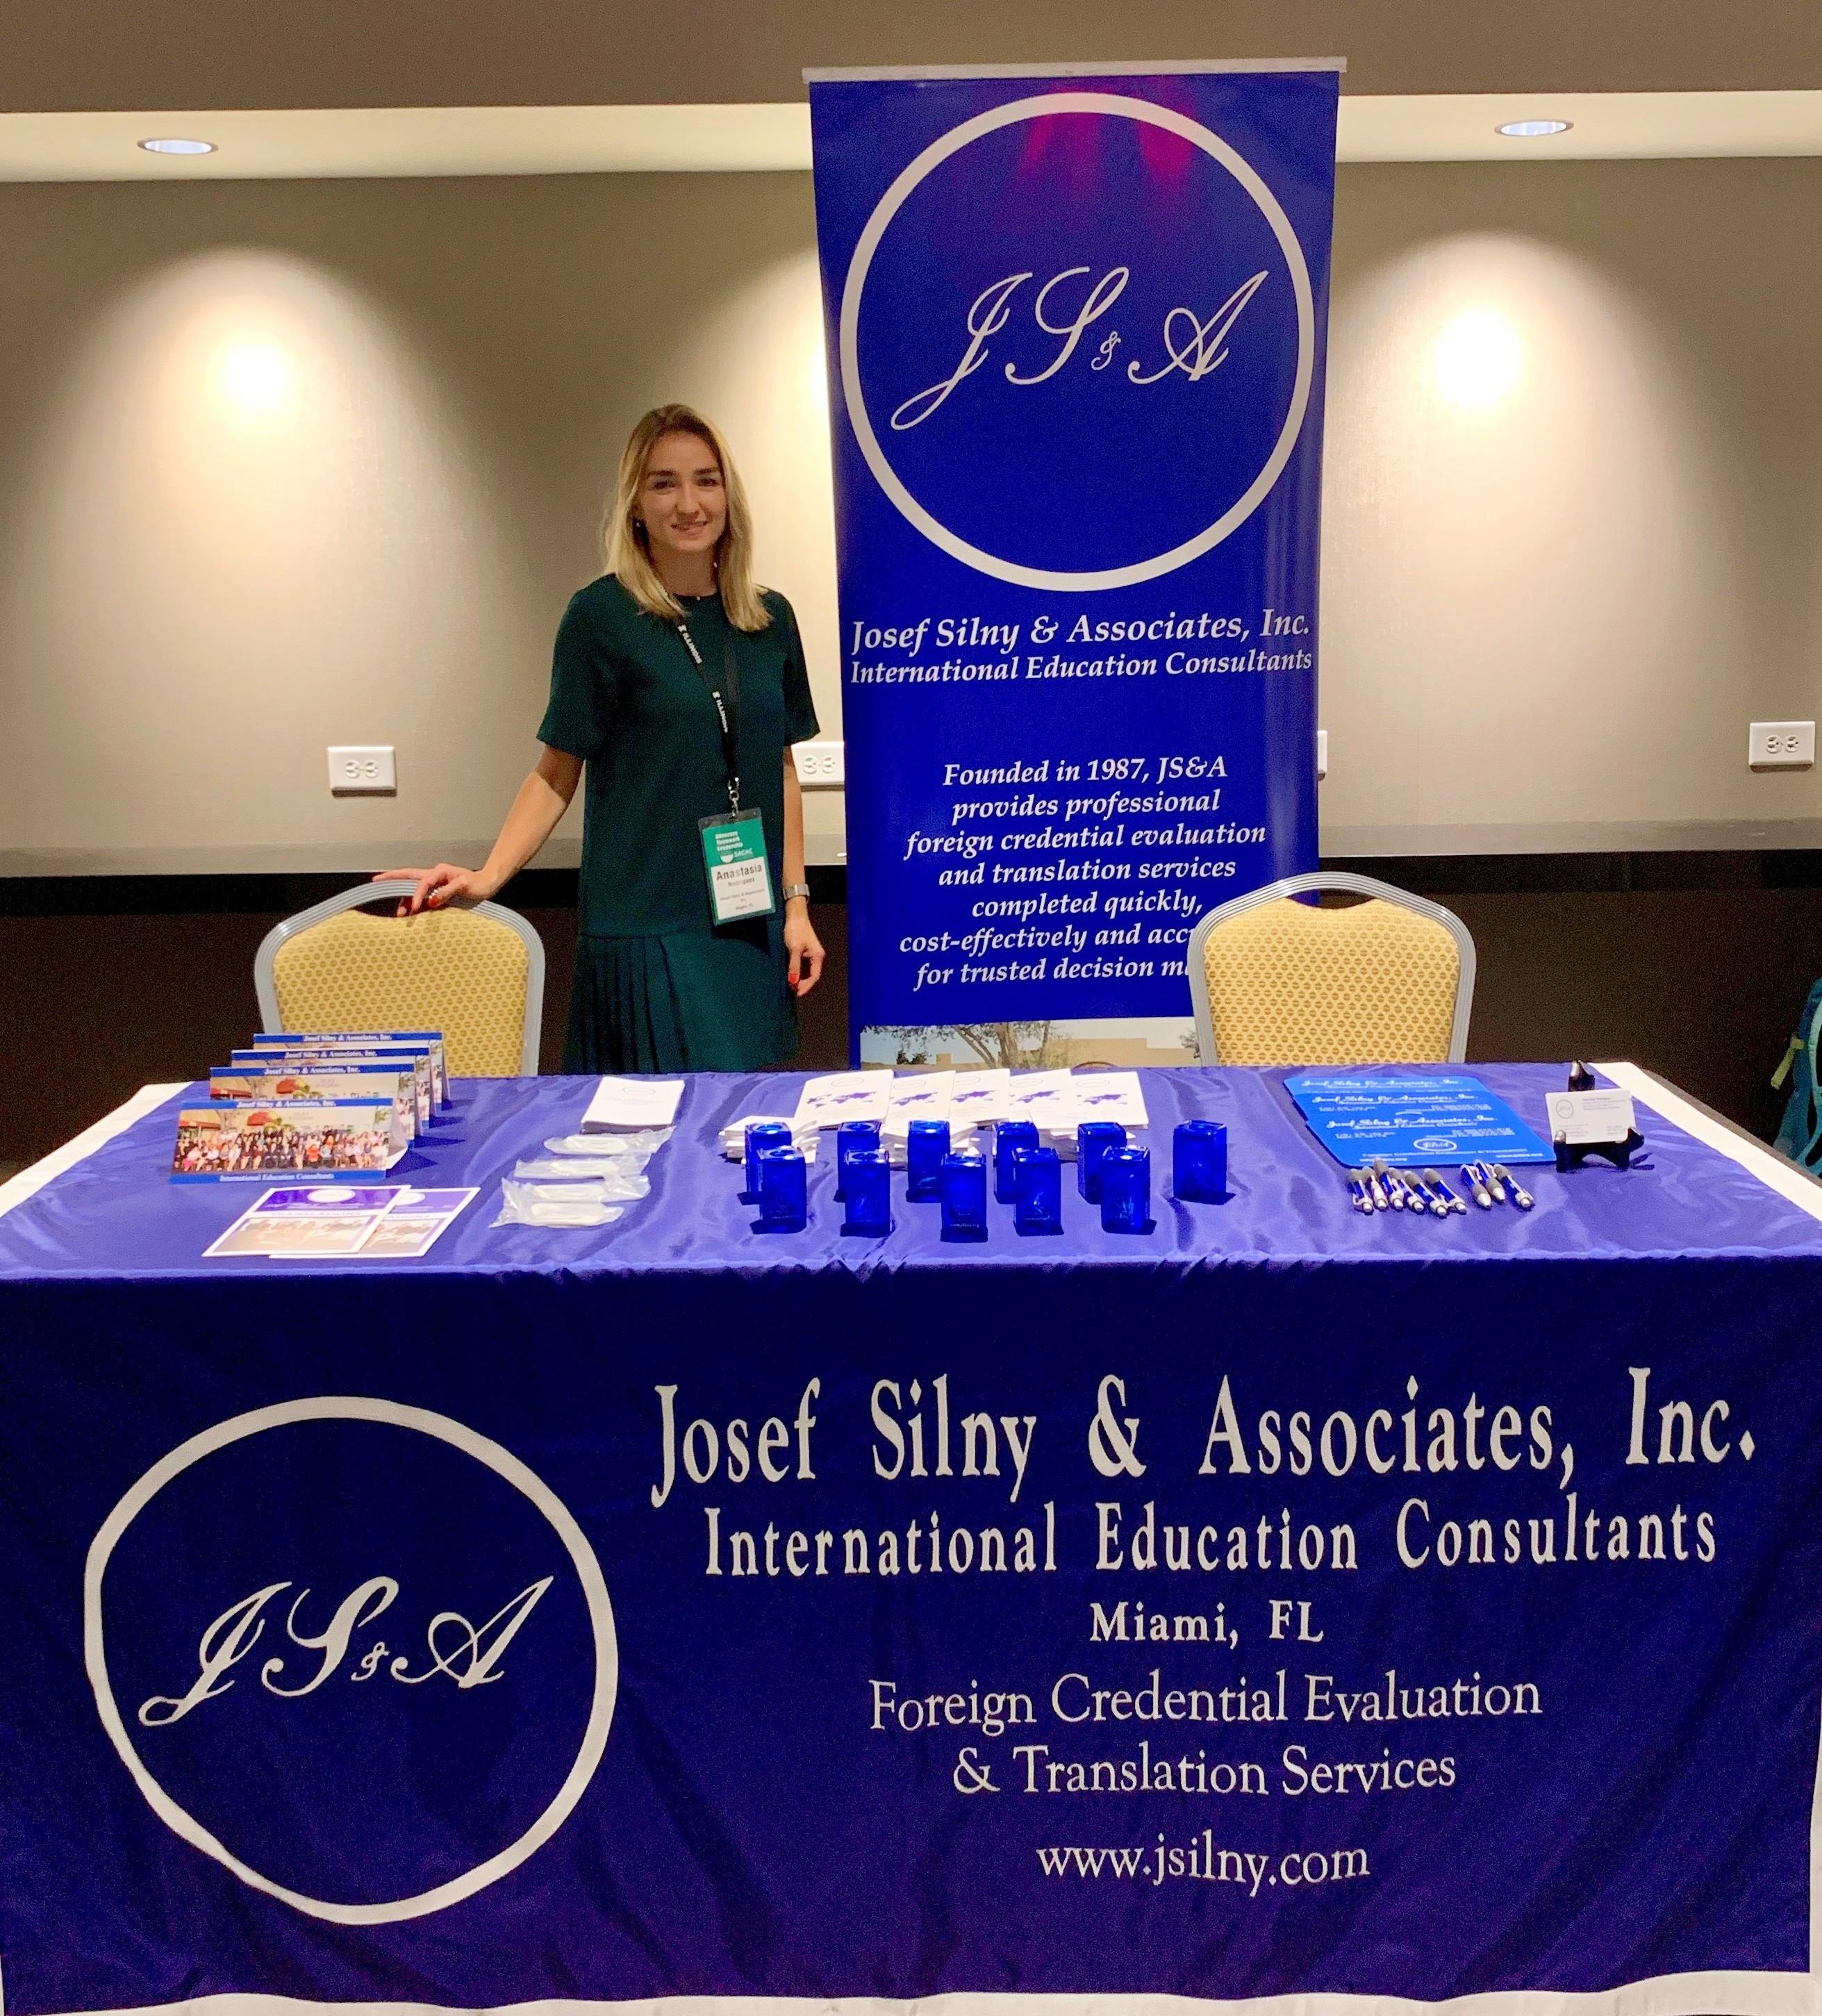 Anastasia_SACAC Annual Conference_4-8-2019.jpg